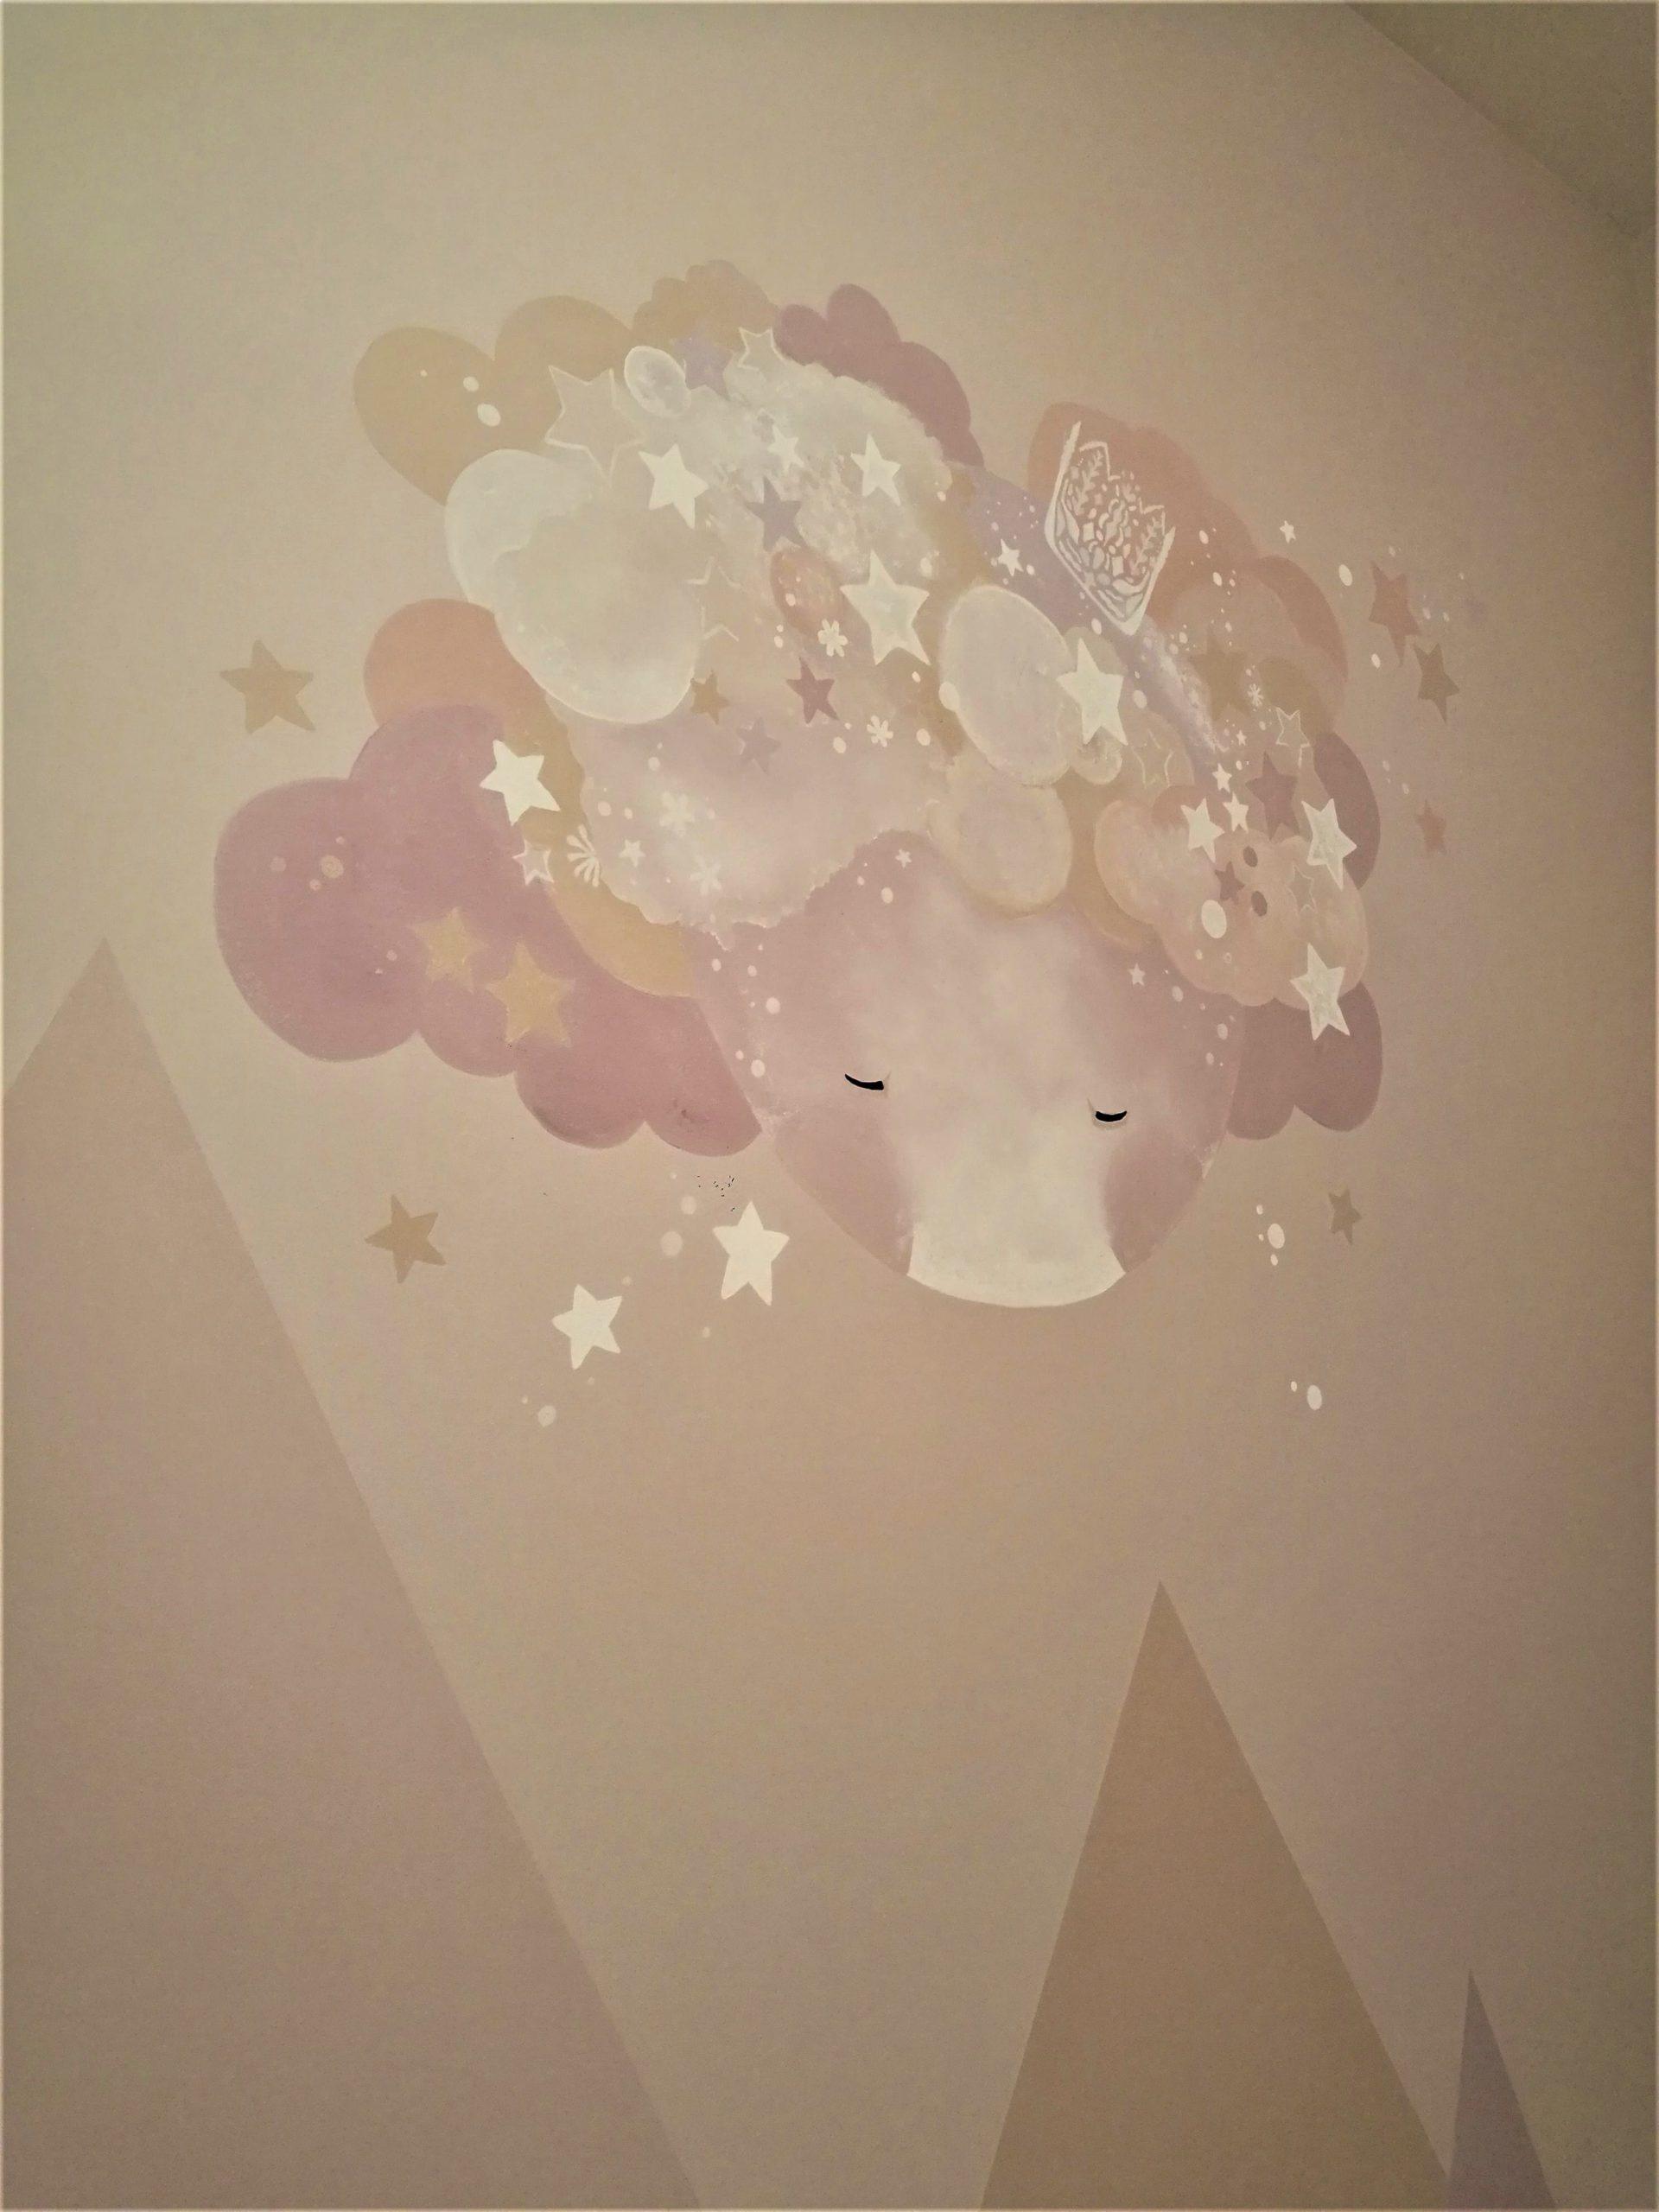 menine-kuryba-sienu-dekoravimas (18)